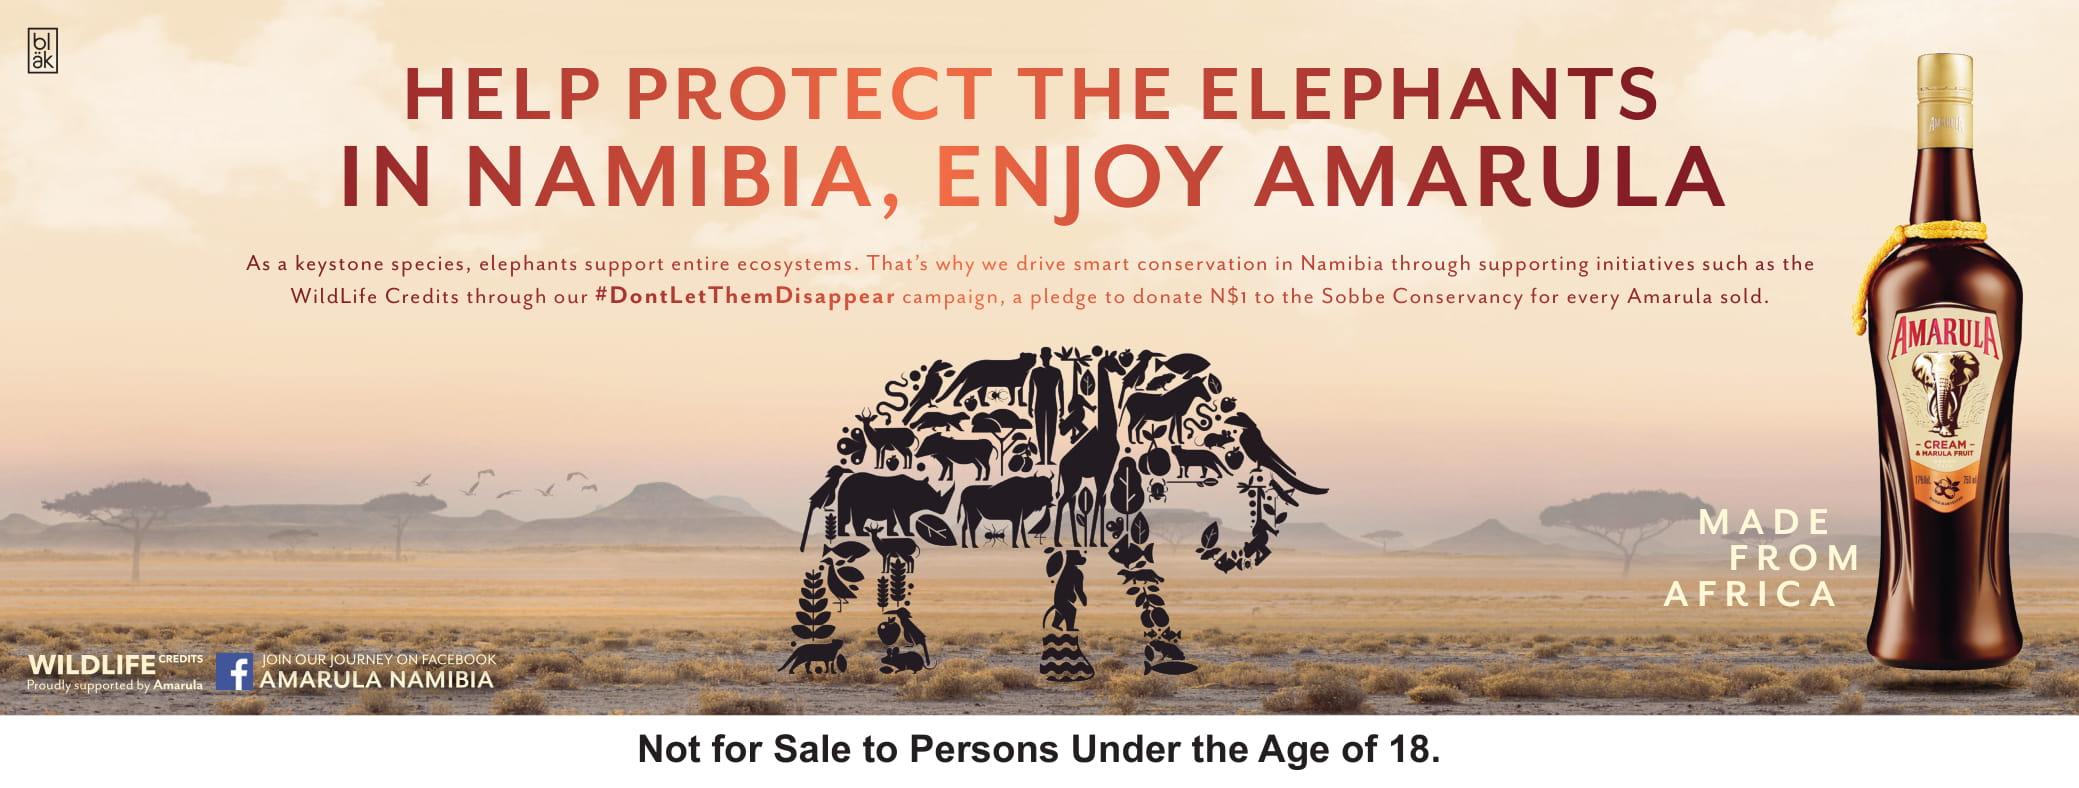 Amarula Namibia